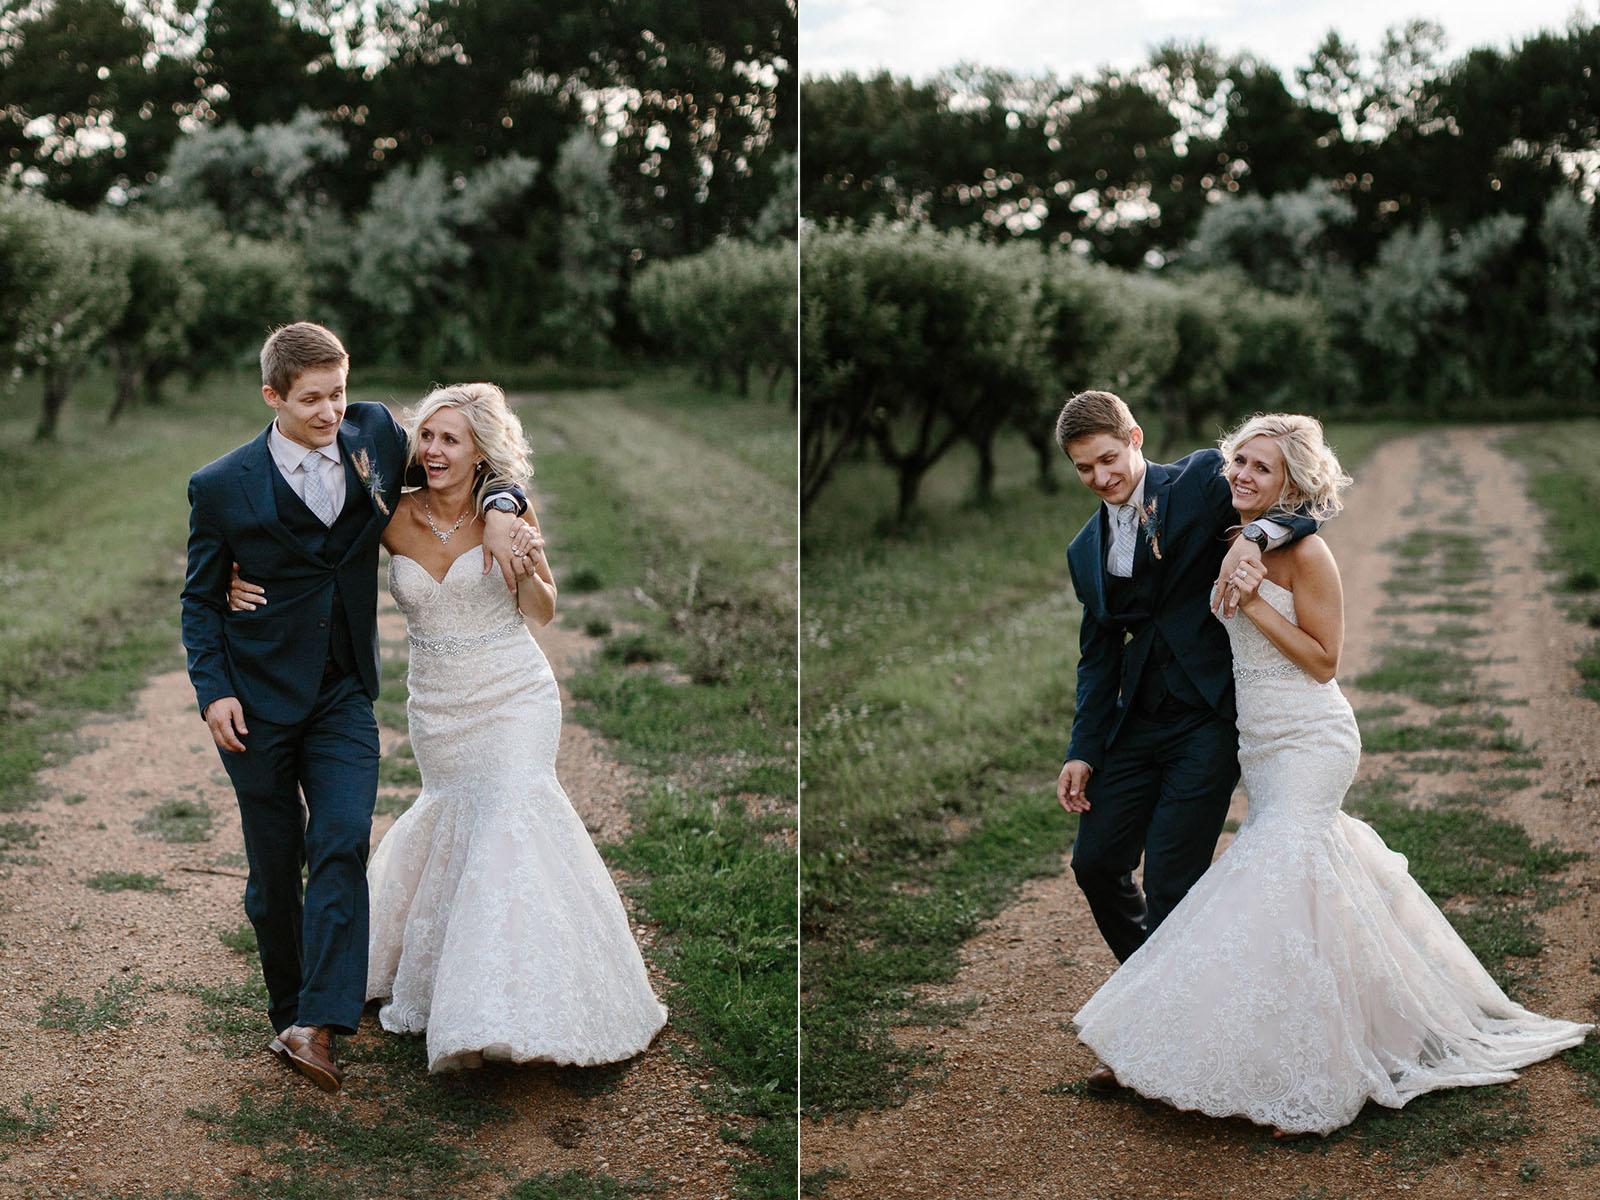 meadow-barn-wedding-sioux-falls-south-dakota-romantic-adventerous-michael-liedtke-photography094.jpg